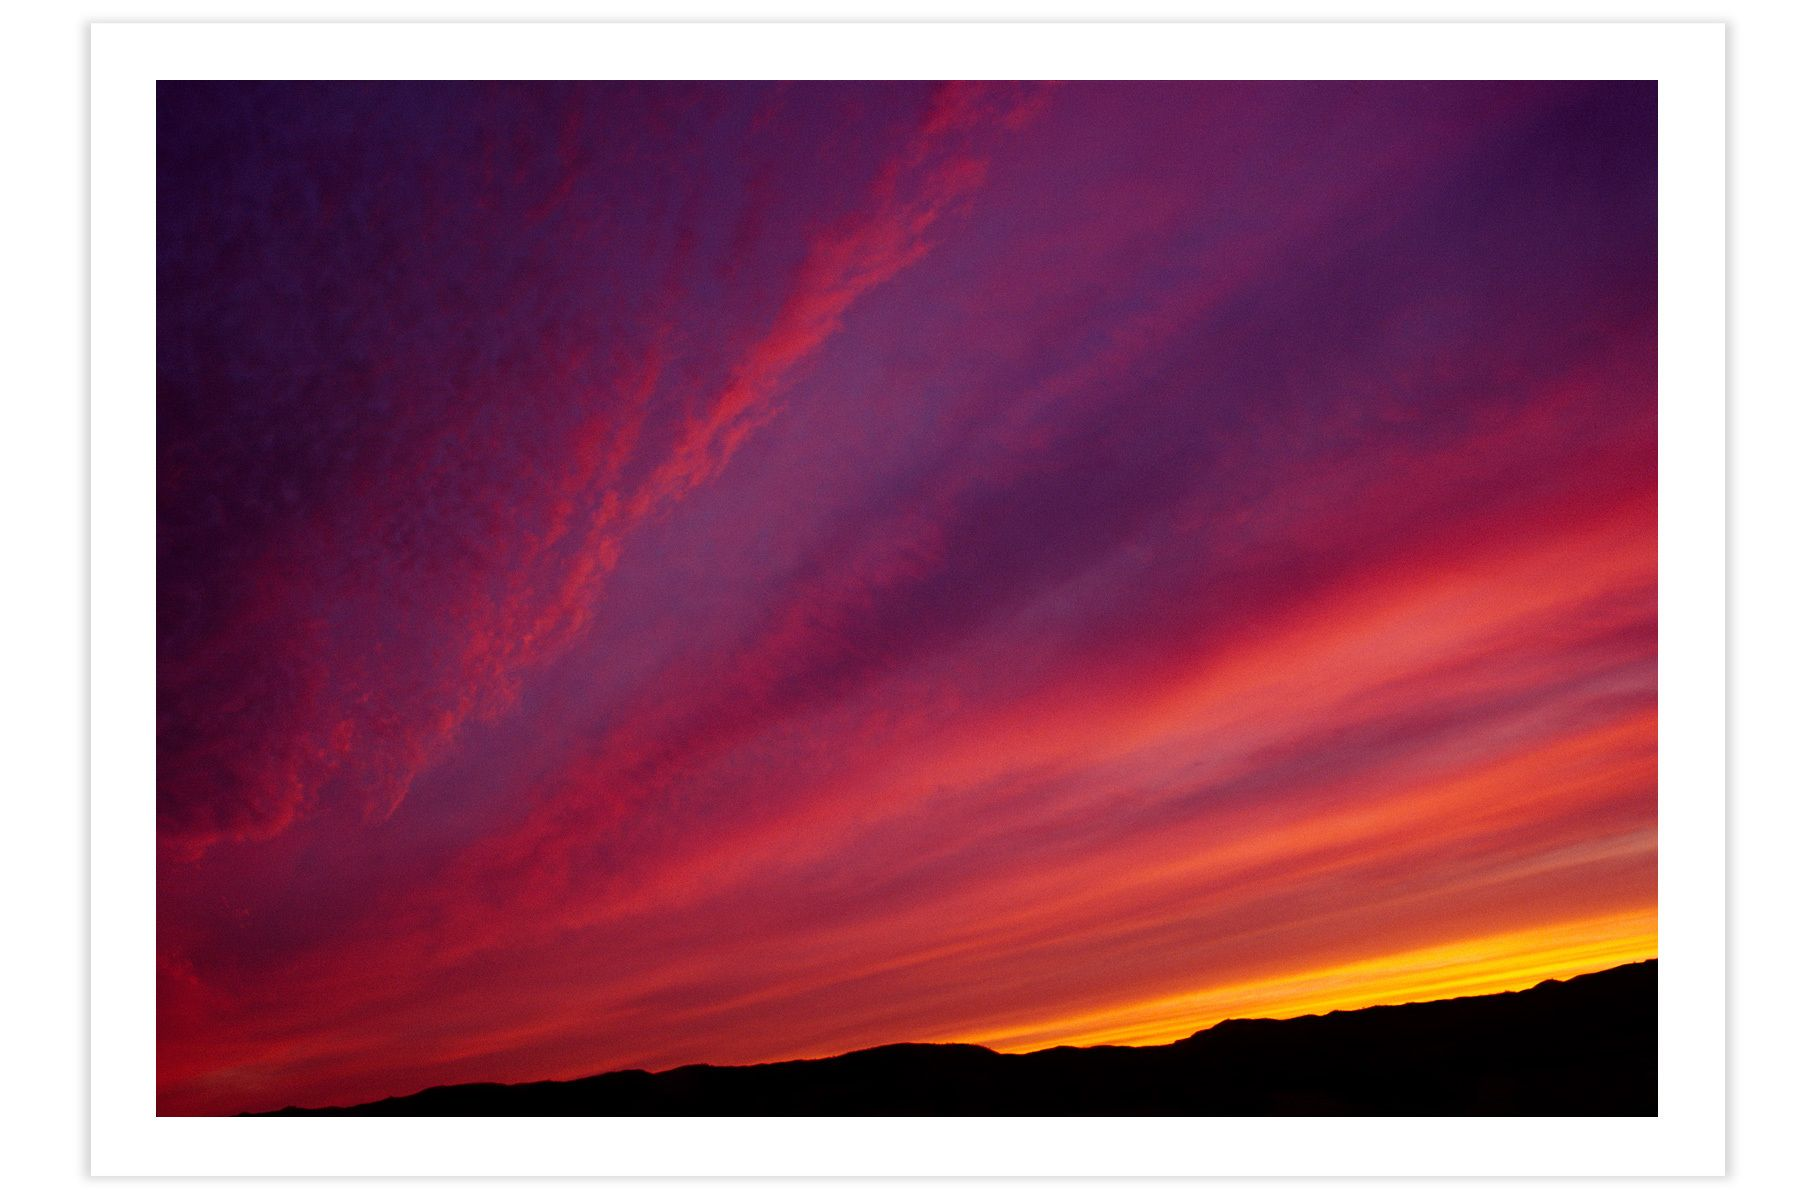 1dazzling_sunset_fine_art_prints.jpg